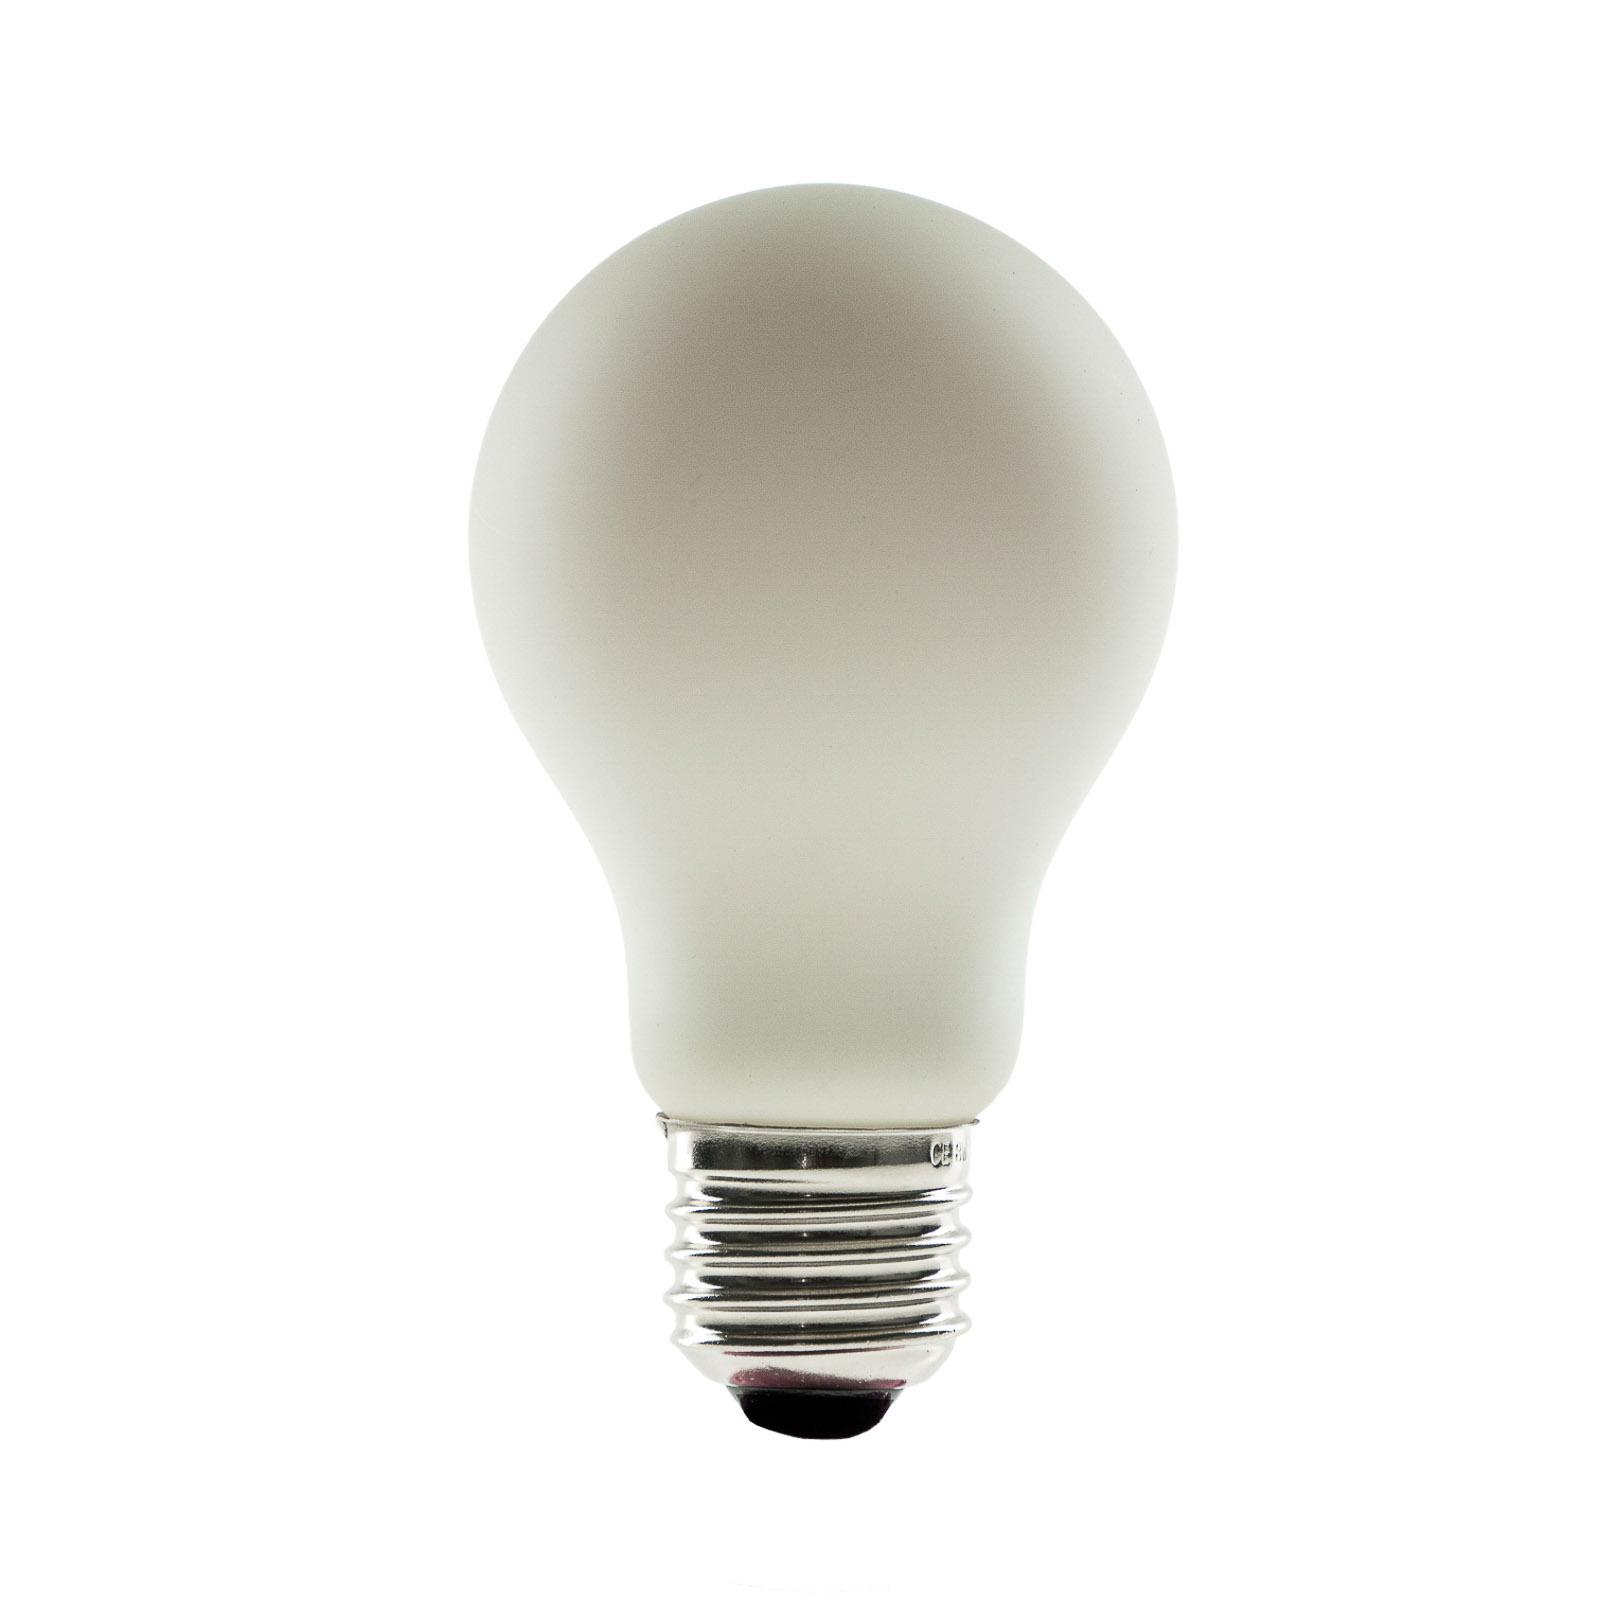 SEGULA żarówka LED E27 8W ambient dimming